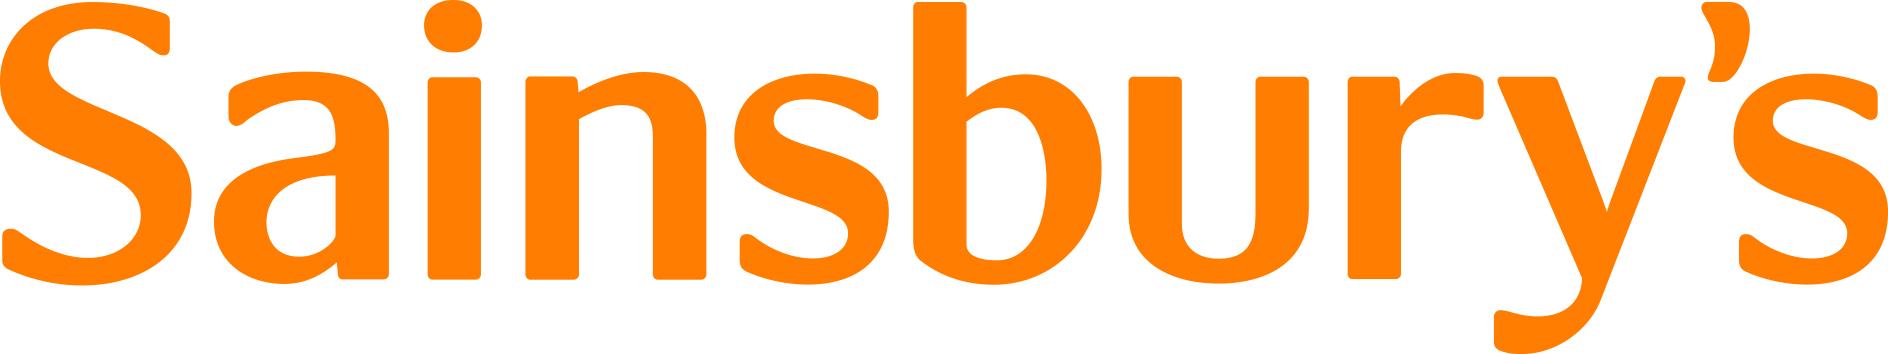 Brand Sainsbury's Logo Cover